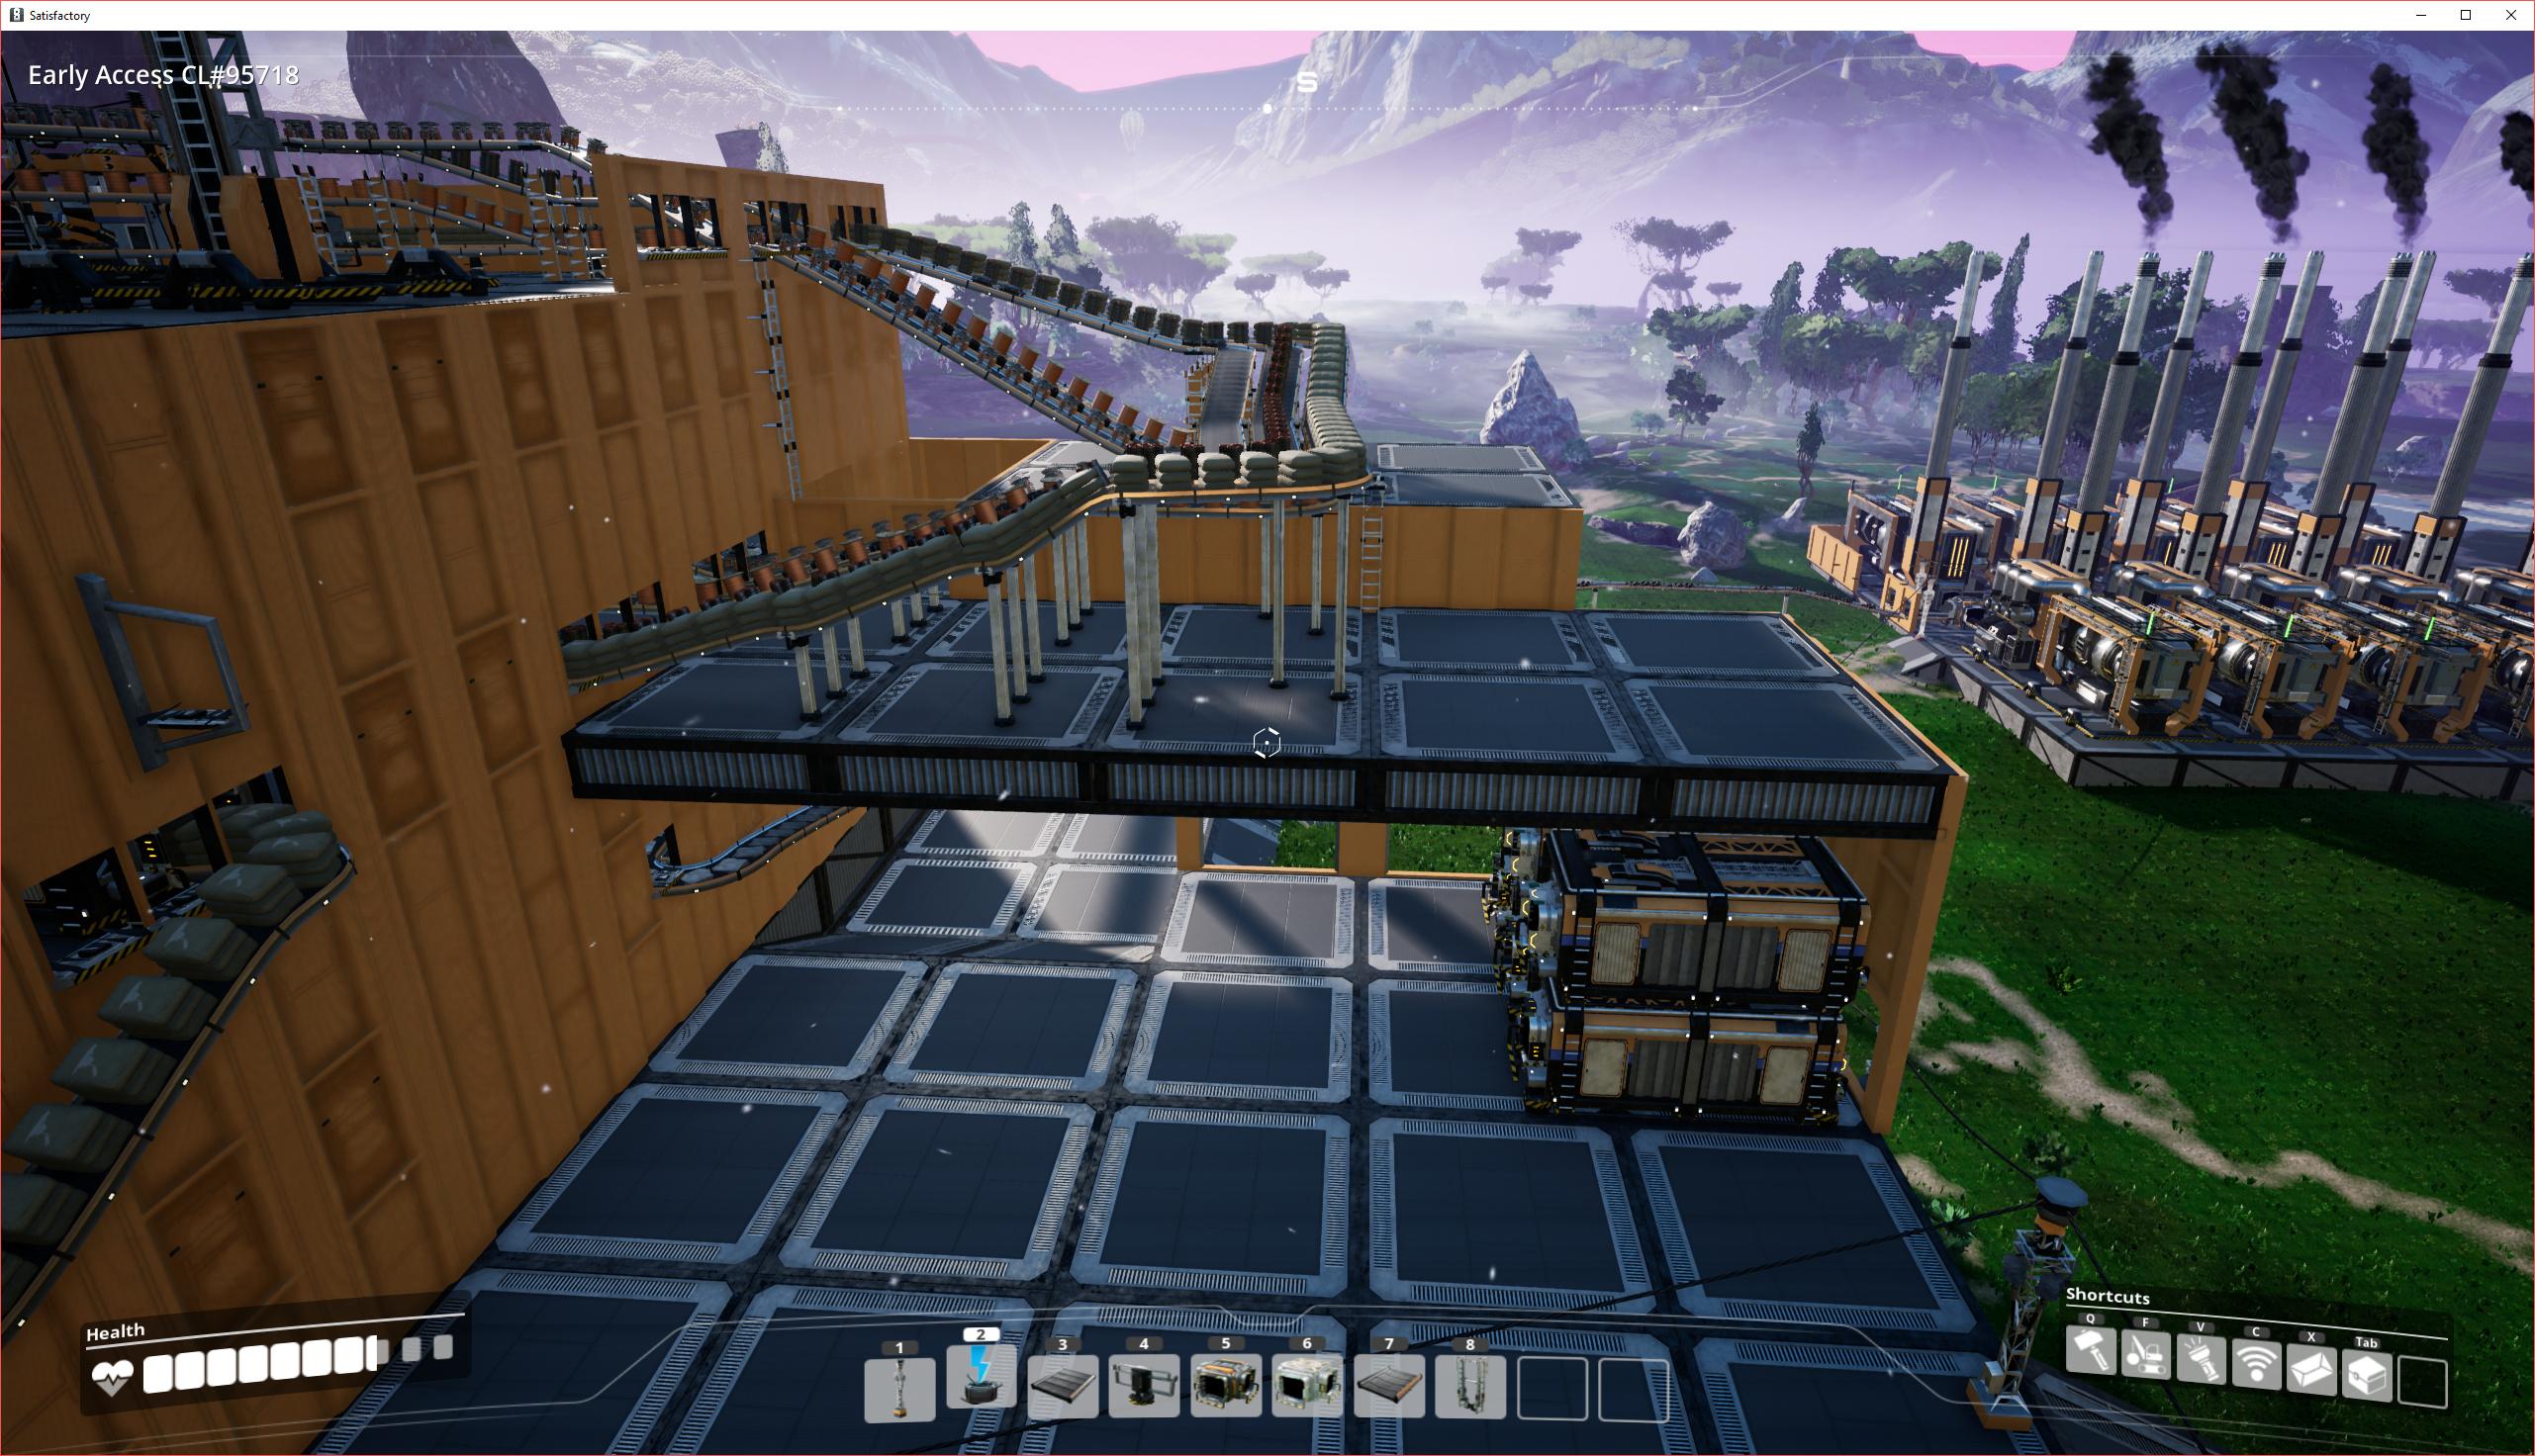 Satisfactory: 3D Factorio by the makers of Sanctum - Games - Quarter